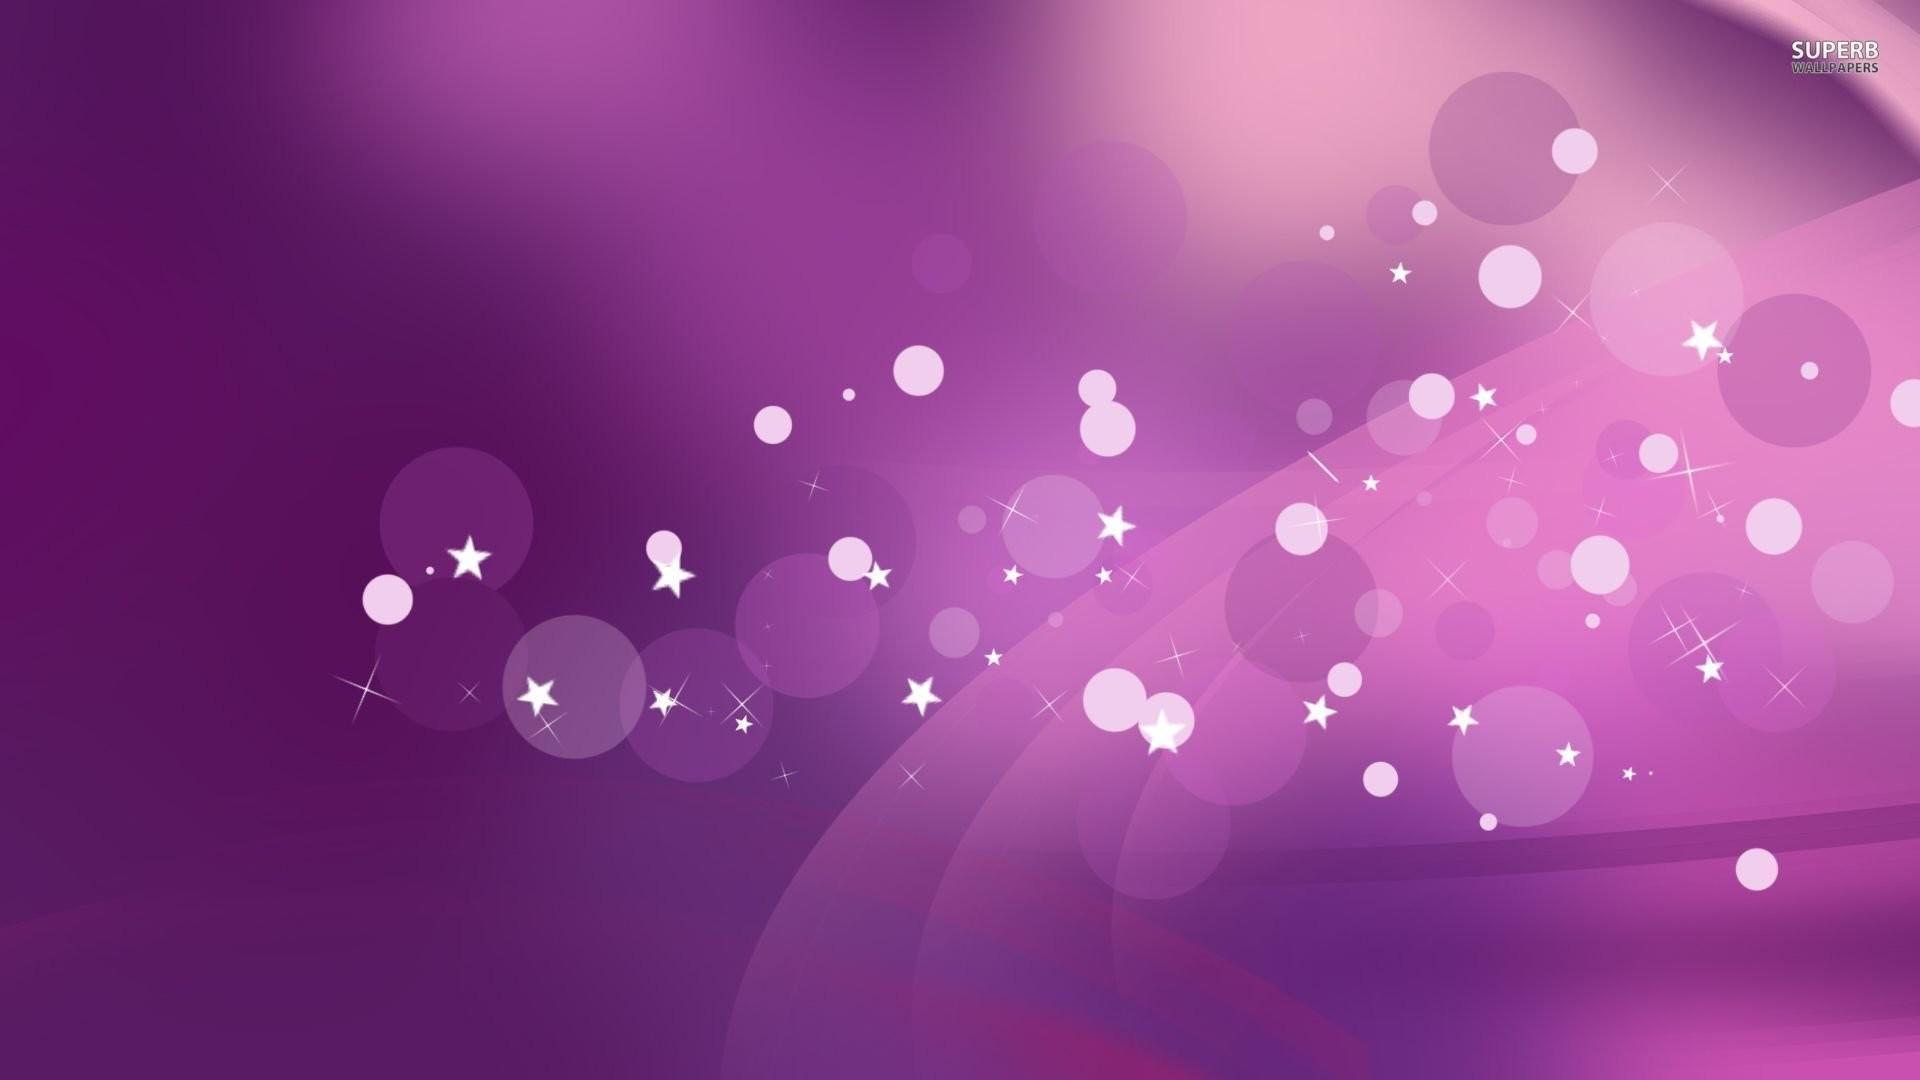 Purple star wallpaper 61 images 1920x1080 purple stars wallpaper altavistaventures Images